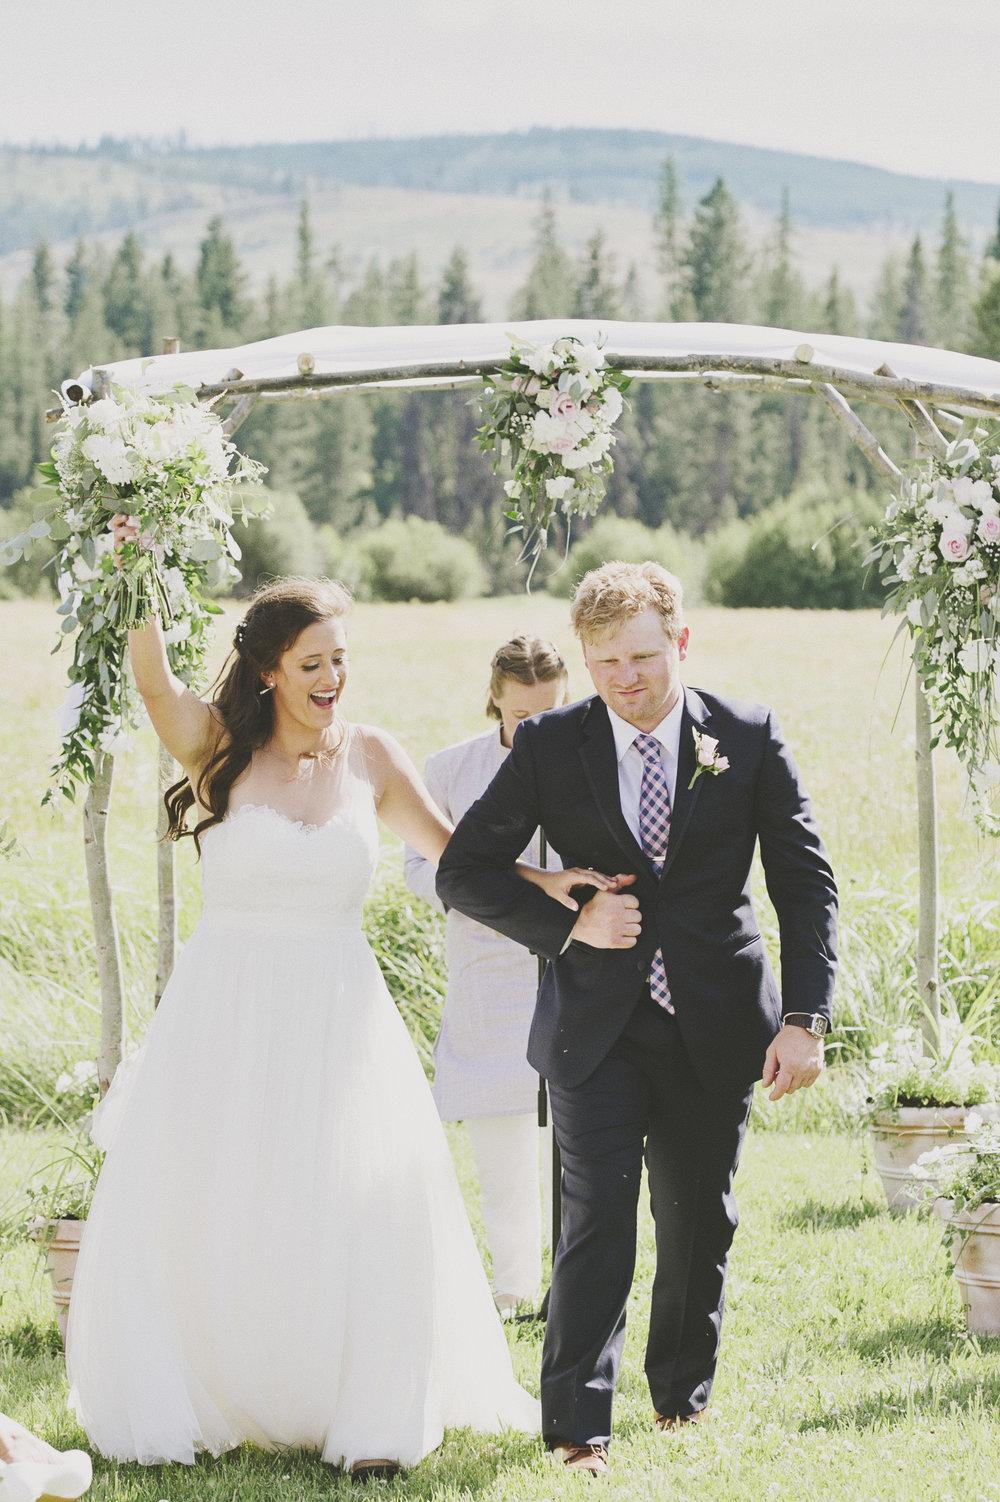 Chloe Hurwitz + Kiefer Martin Wedding_Grey Wolf Ranch_Kelsey Lane Photography1669 copy.jpg